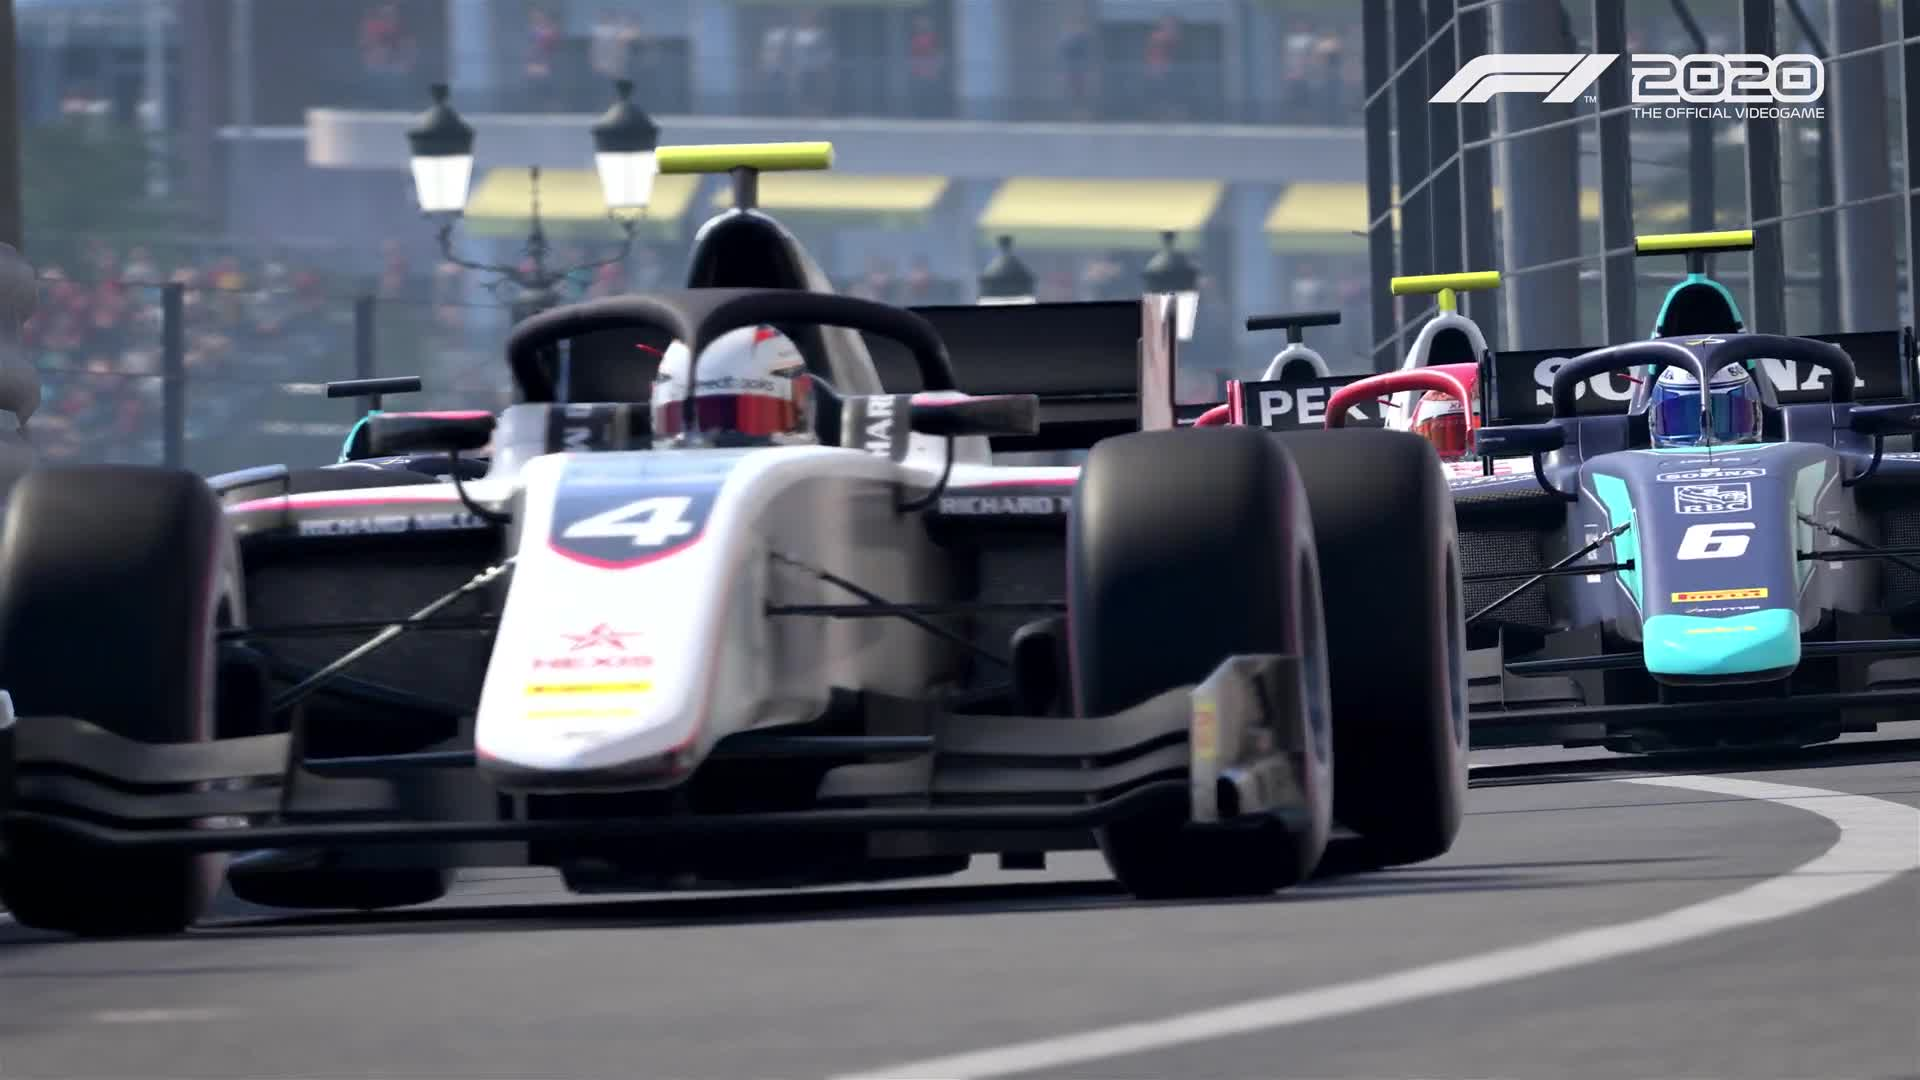 Trailer, Rennspiel, Codemasters, Formel 1, F1, F1 2020